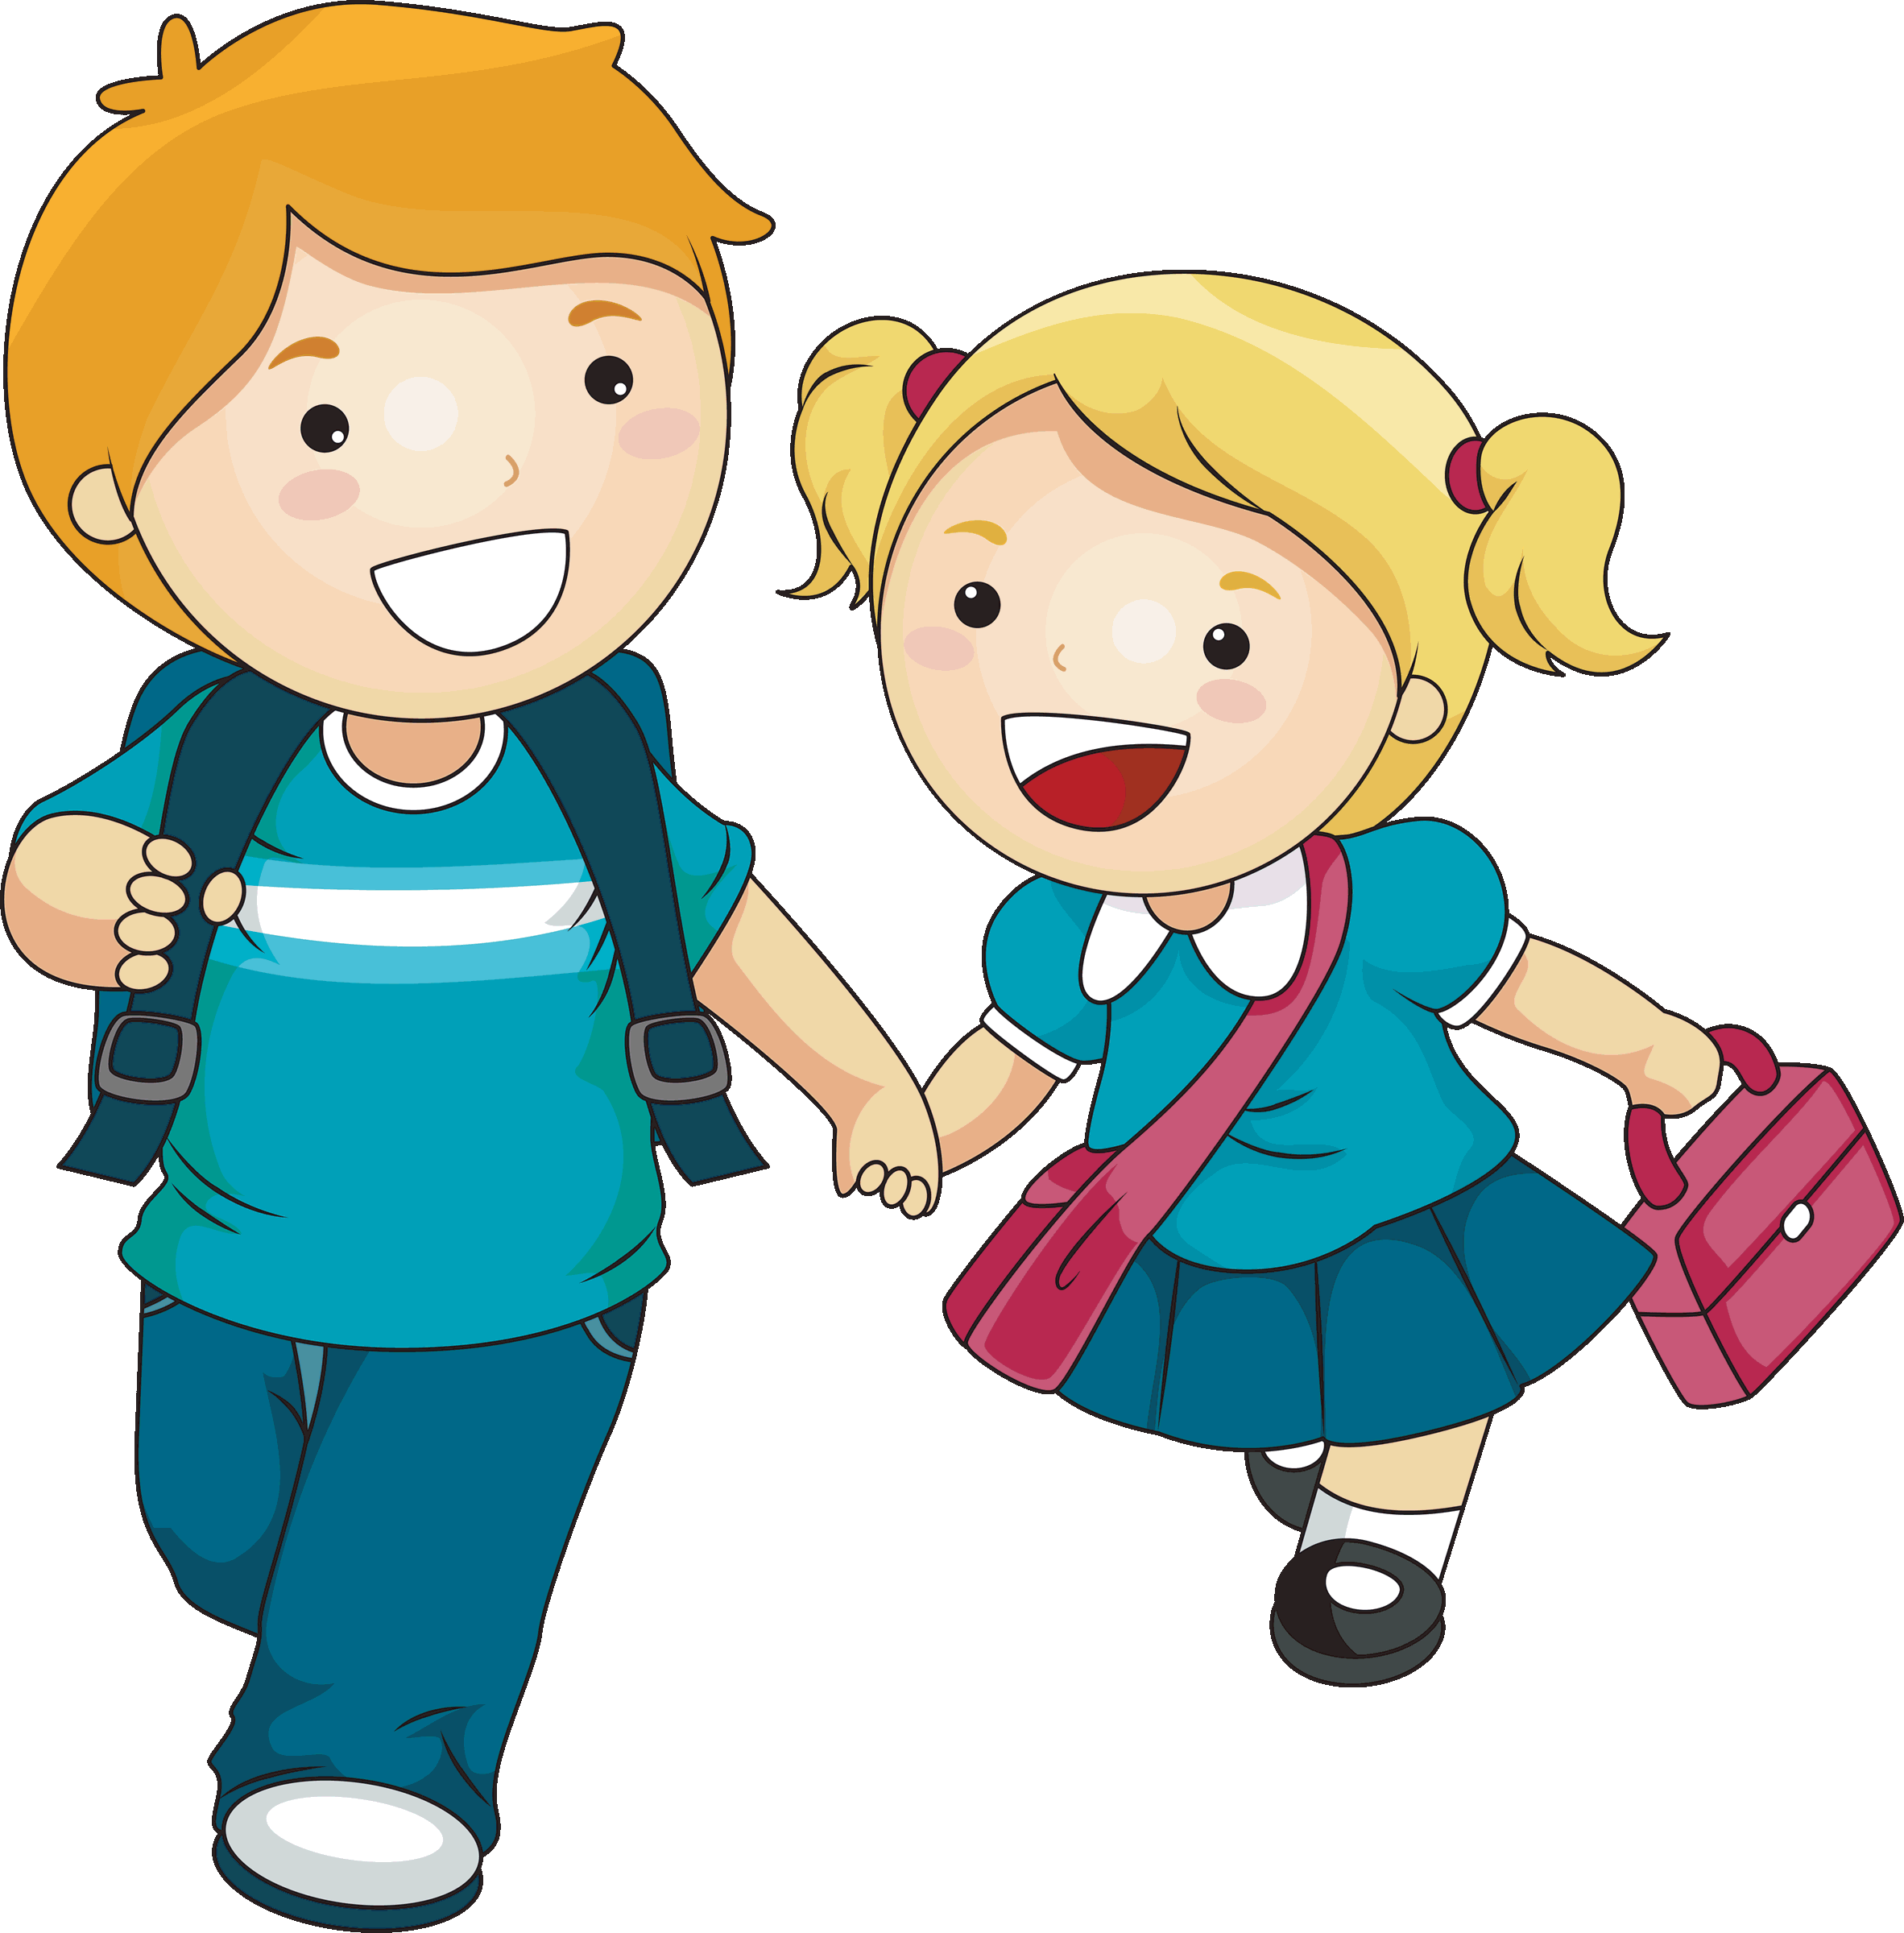 Free Download Dancing Children Clip Art Hd Wallpaper Car Pictures - Children  HD PNG - PNG HD Images Of Children